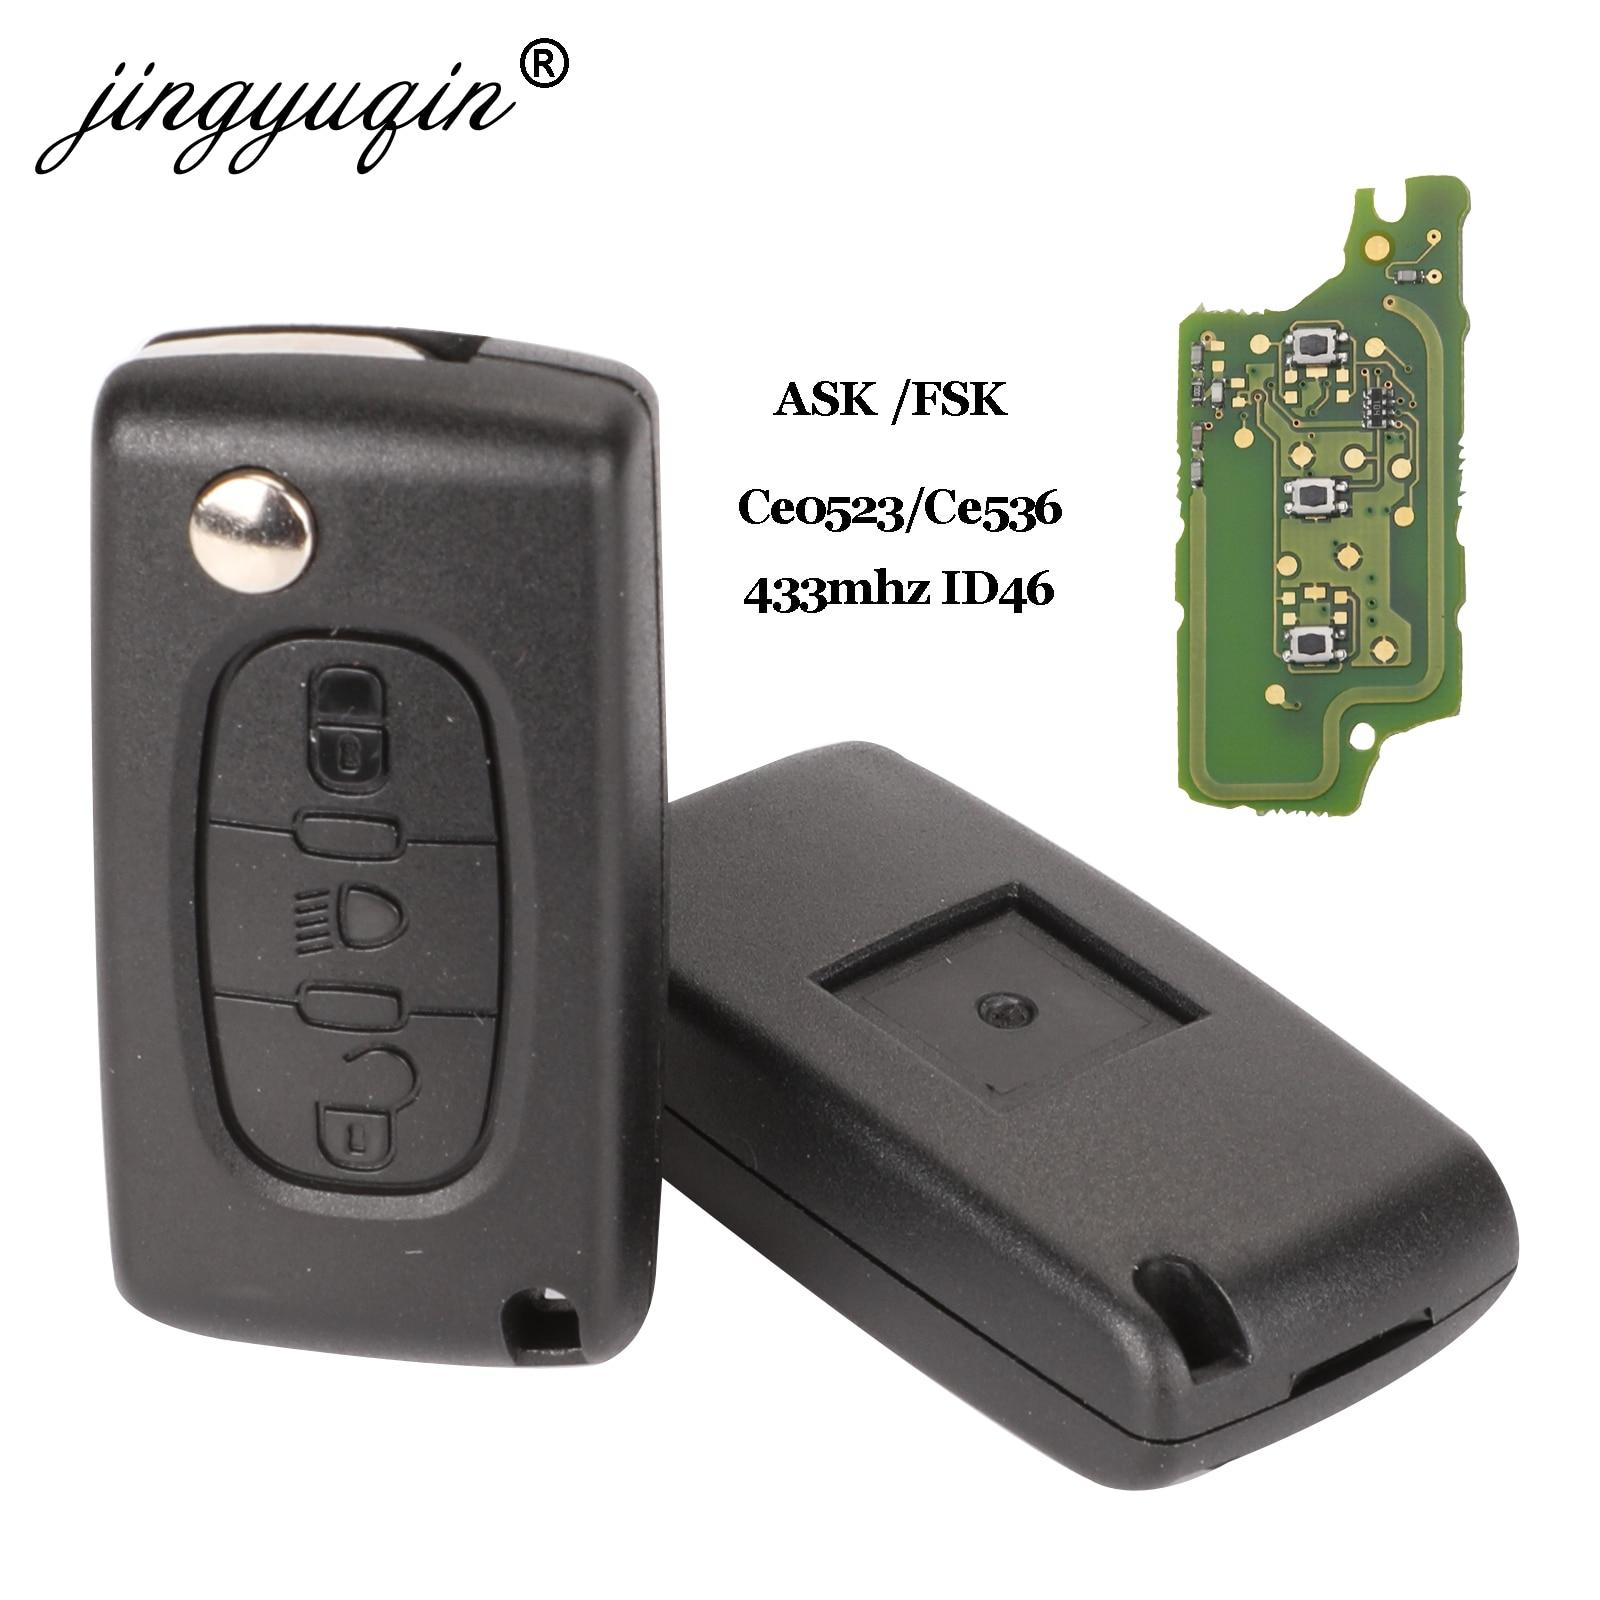 Jingyuqin ASK/FSK 433Mhz ID46 для Citroen C2 C3 C4 C5 C6 C8 3 кнопки свет флип дистанционный ключ-брелок от машины VA2/HCA Blade CE0523 Ce0536